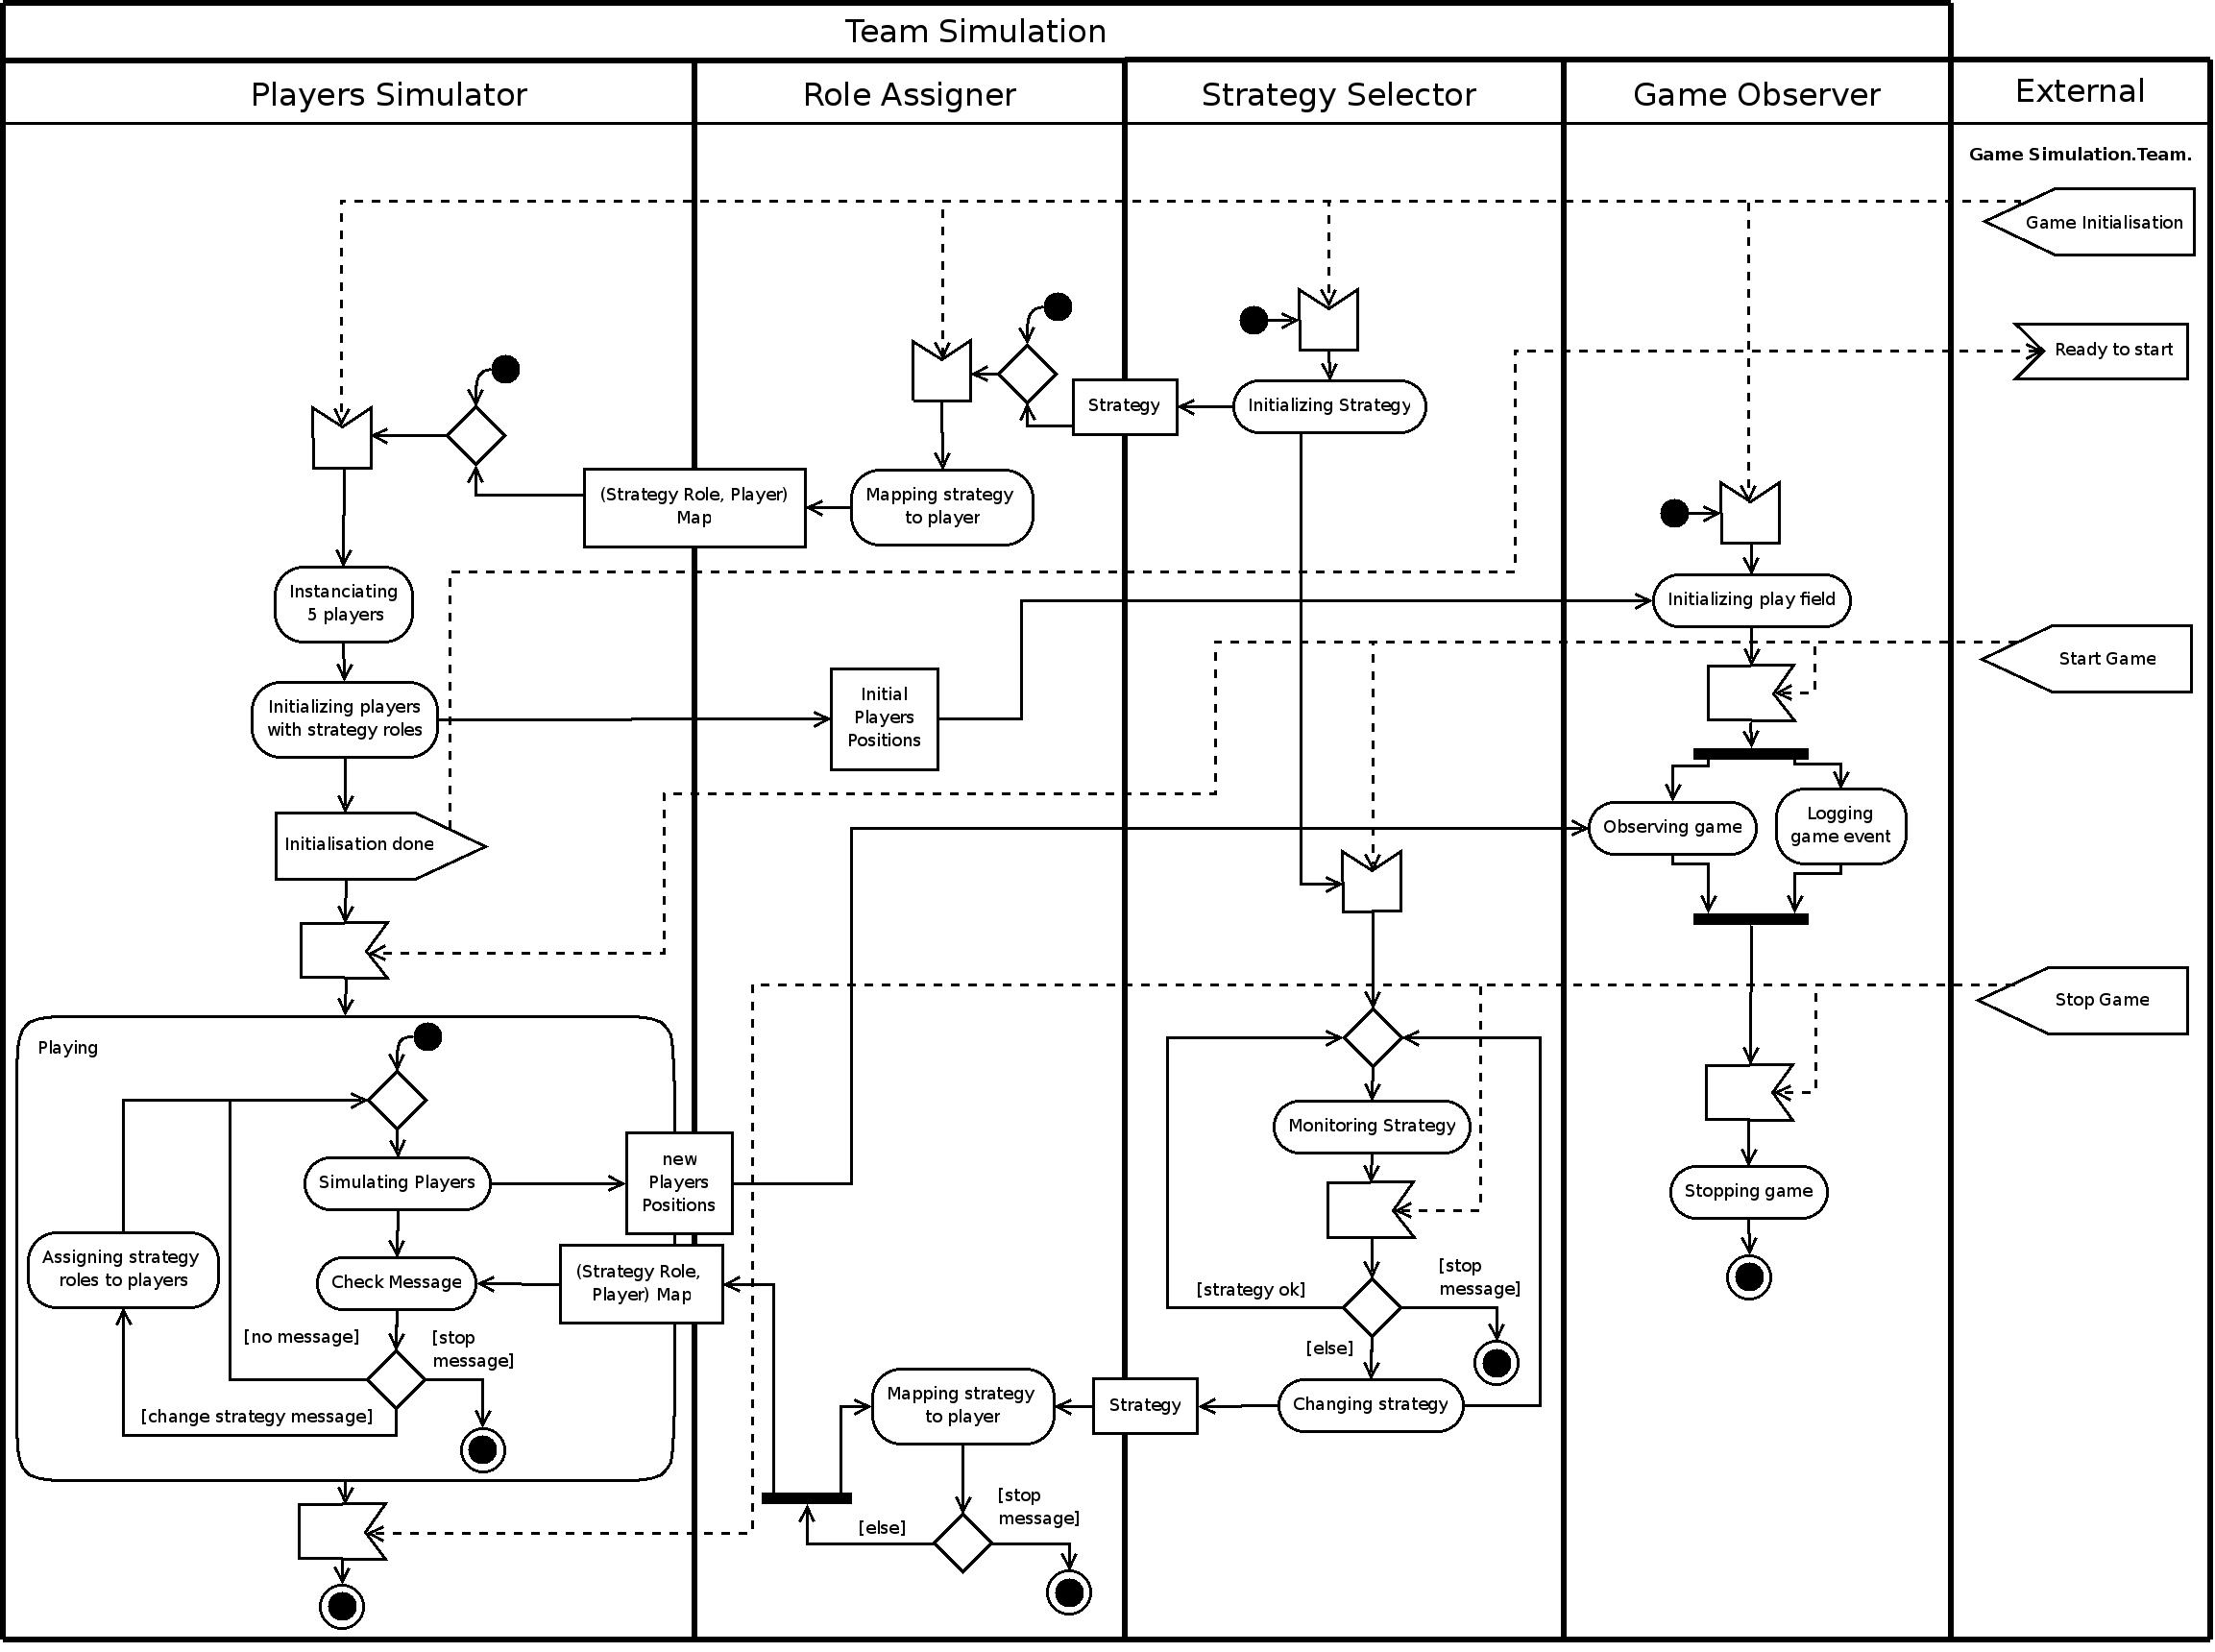 Visio Activity Diagram Trane Heat Pump Thermostat Wiring Rube Goldberg Machine Product